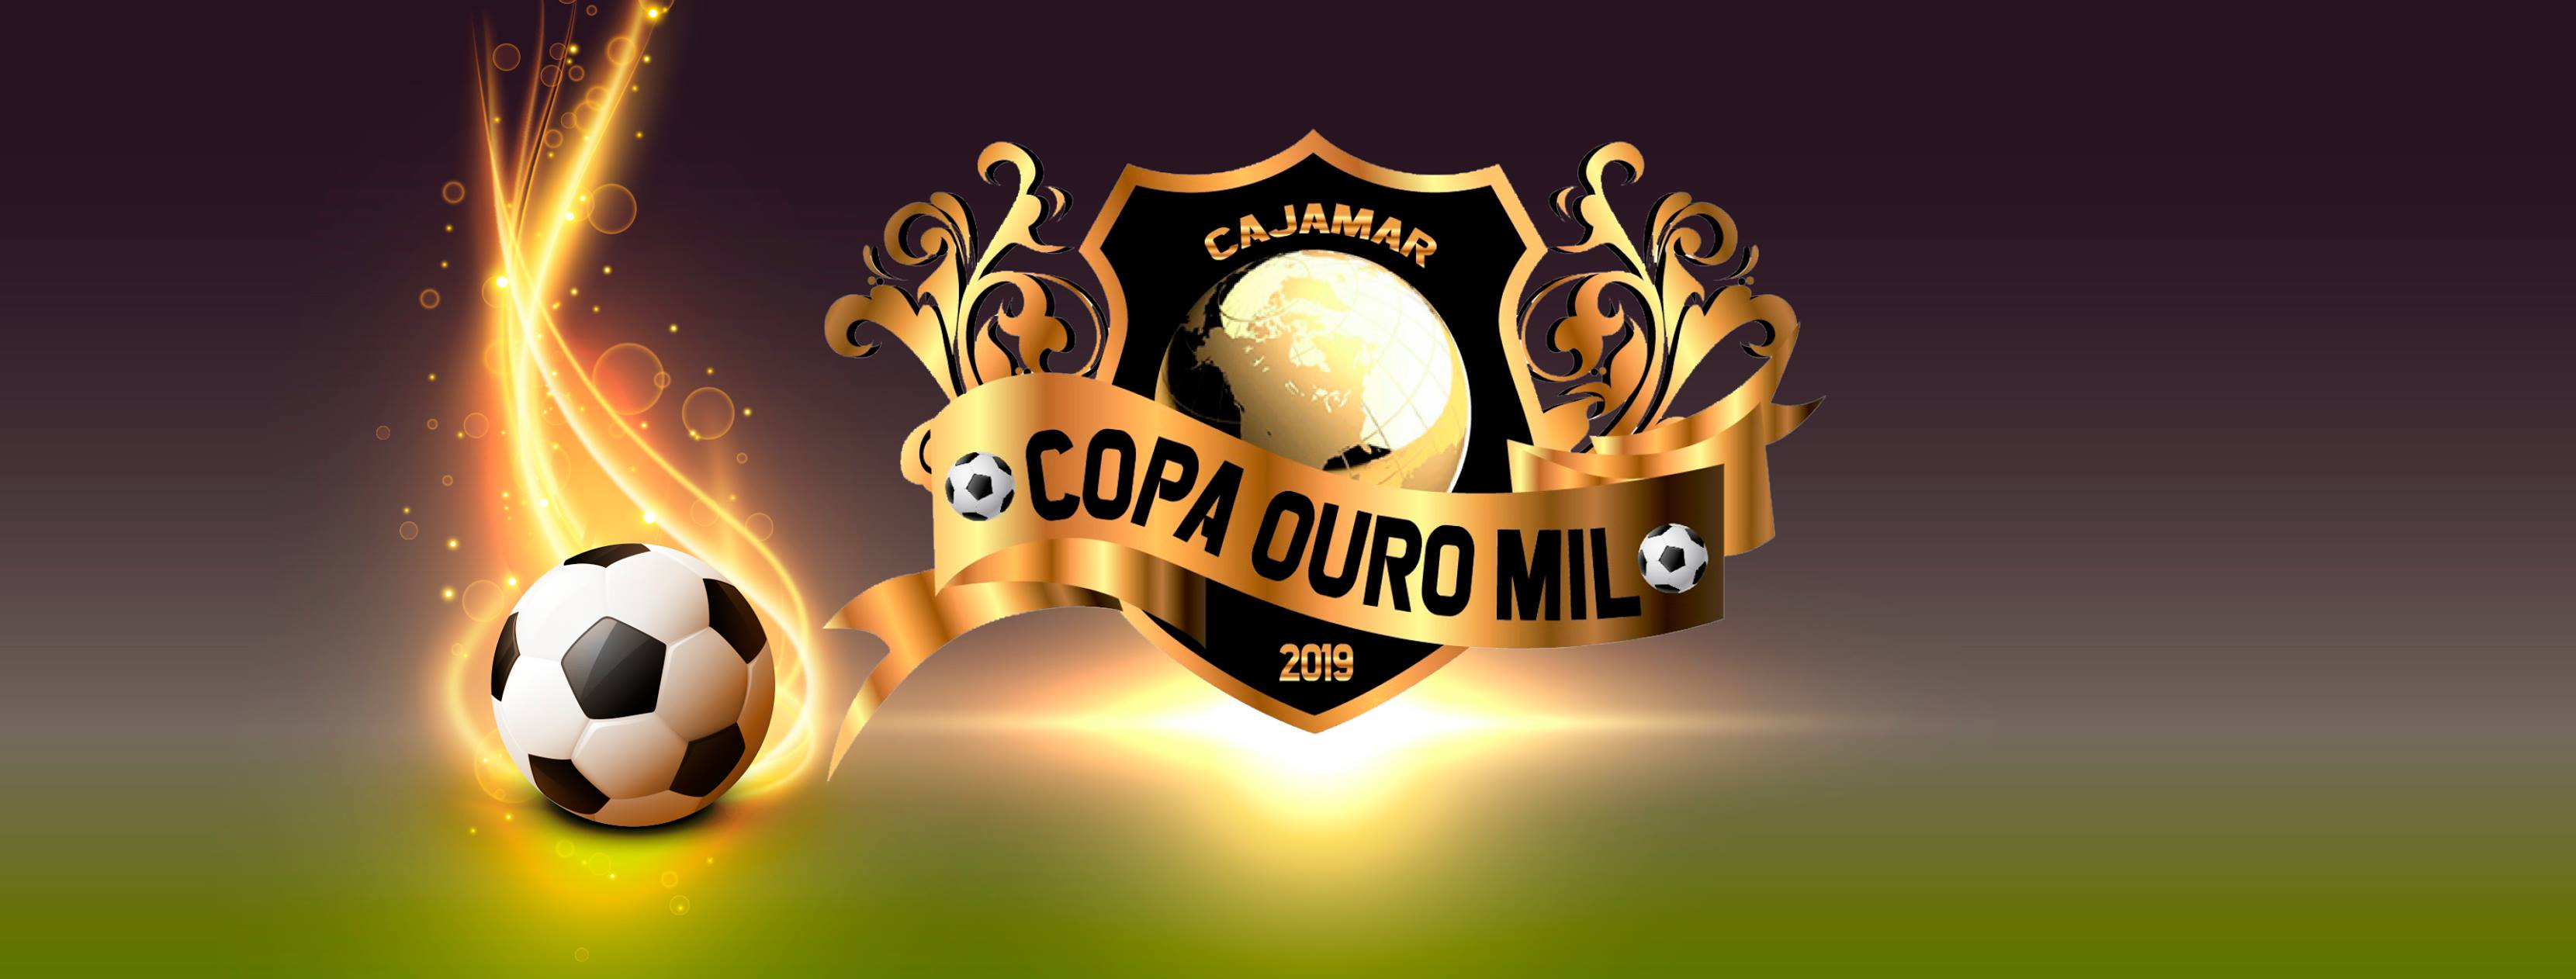 LANÇAMENTO COPA OURO MIL 2019 Programa Esporte Top #LiveTopTVOn 12/01/2019